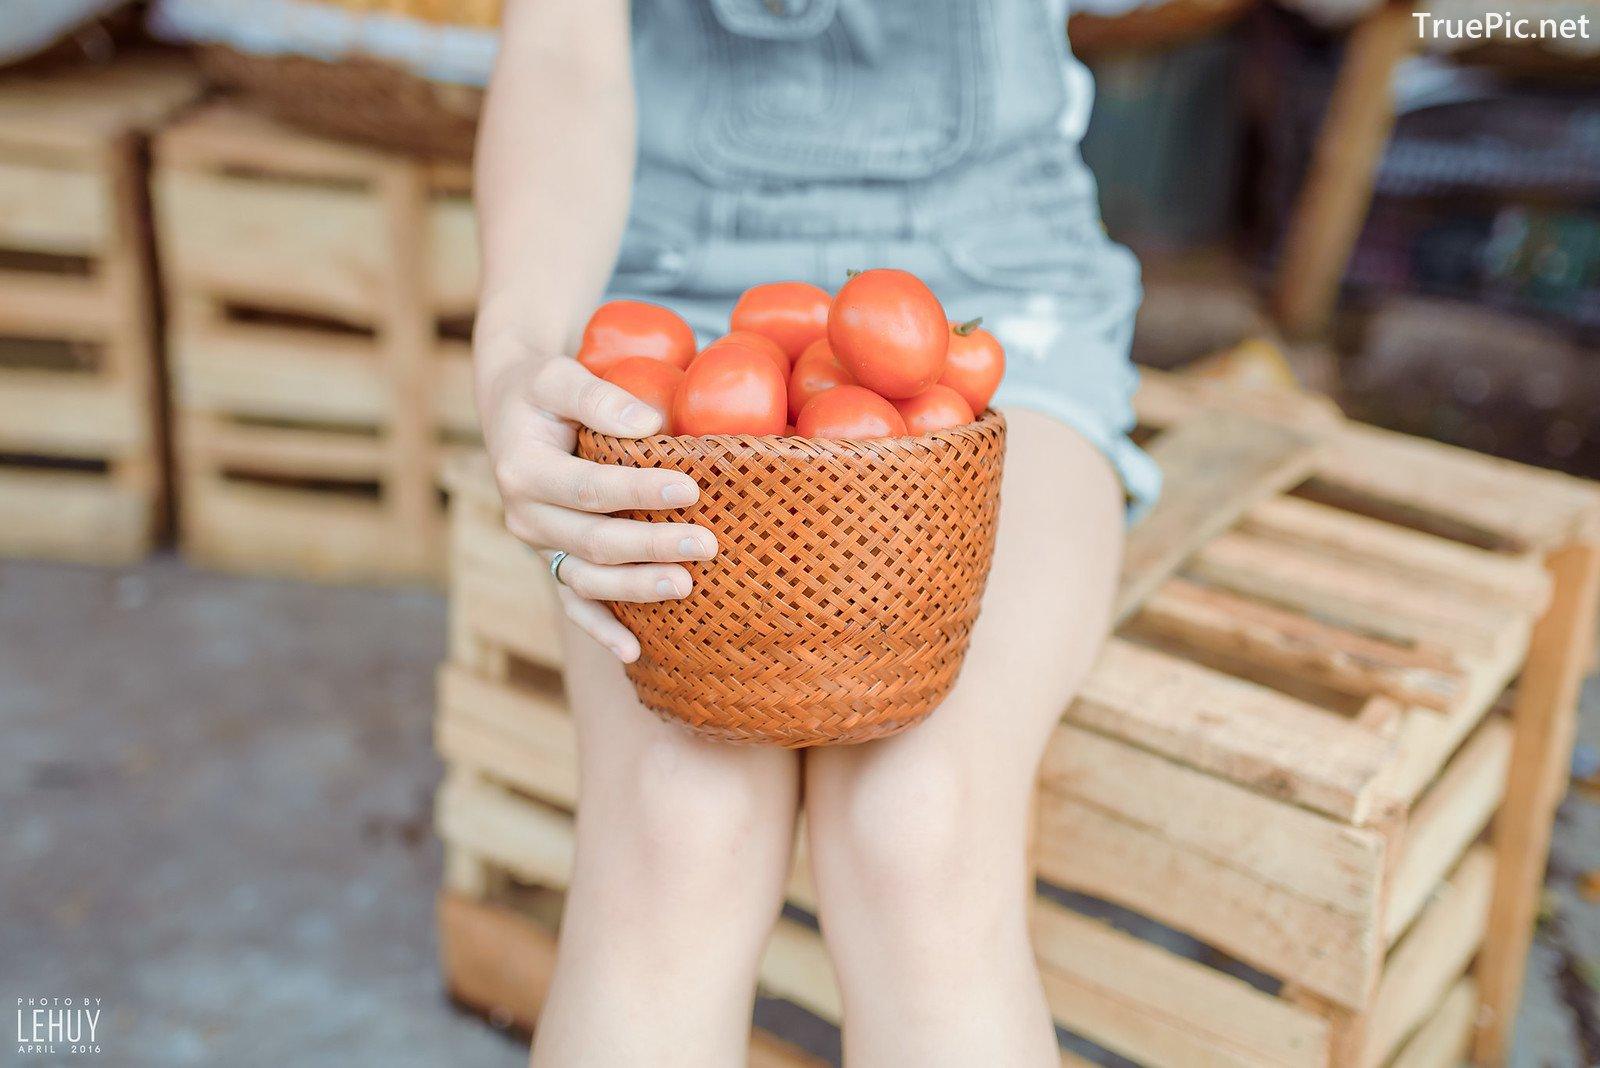 Image-Vietnamese-Hot-Girl-Photo-Album-Tomato-Little-Girl-Cute-TruePic.net- Picture-7